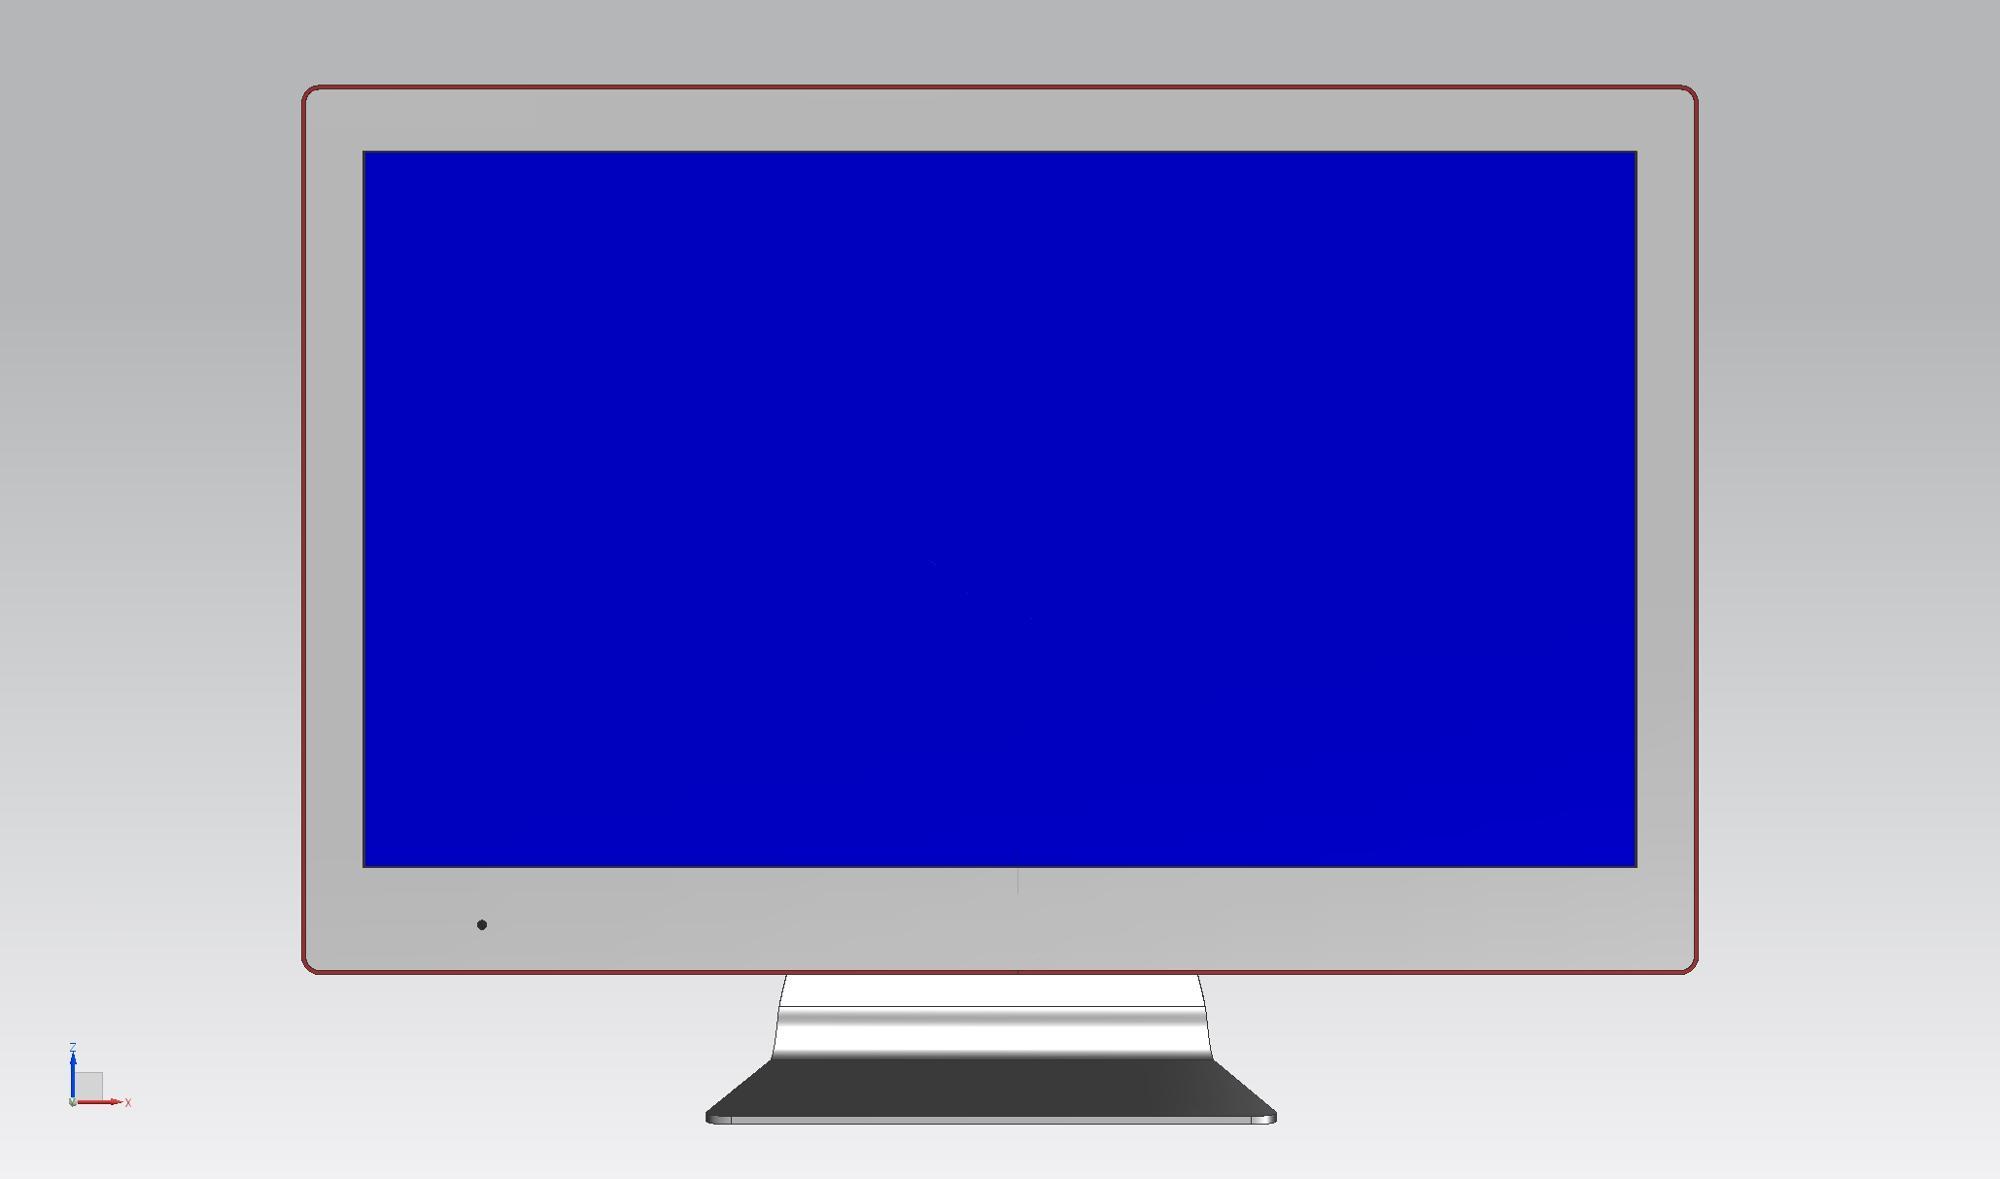 215PC-80mm-AIO-0305-V2_F.jpg